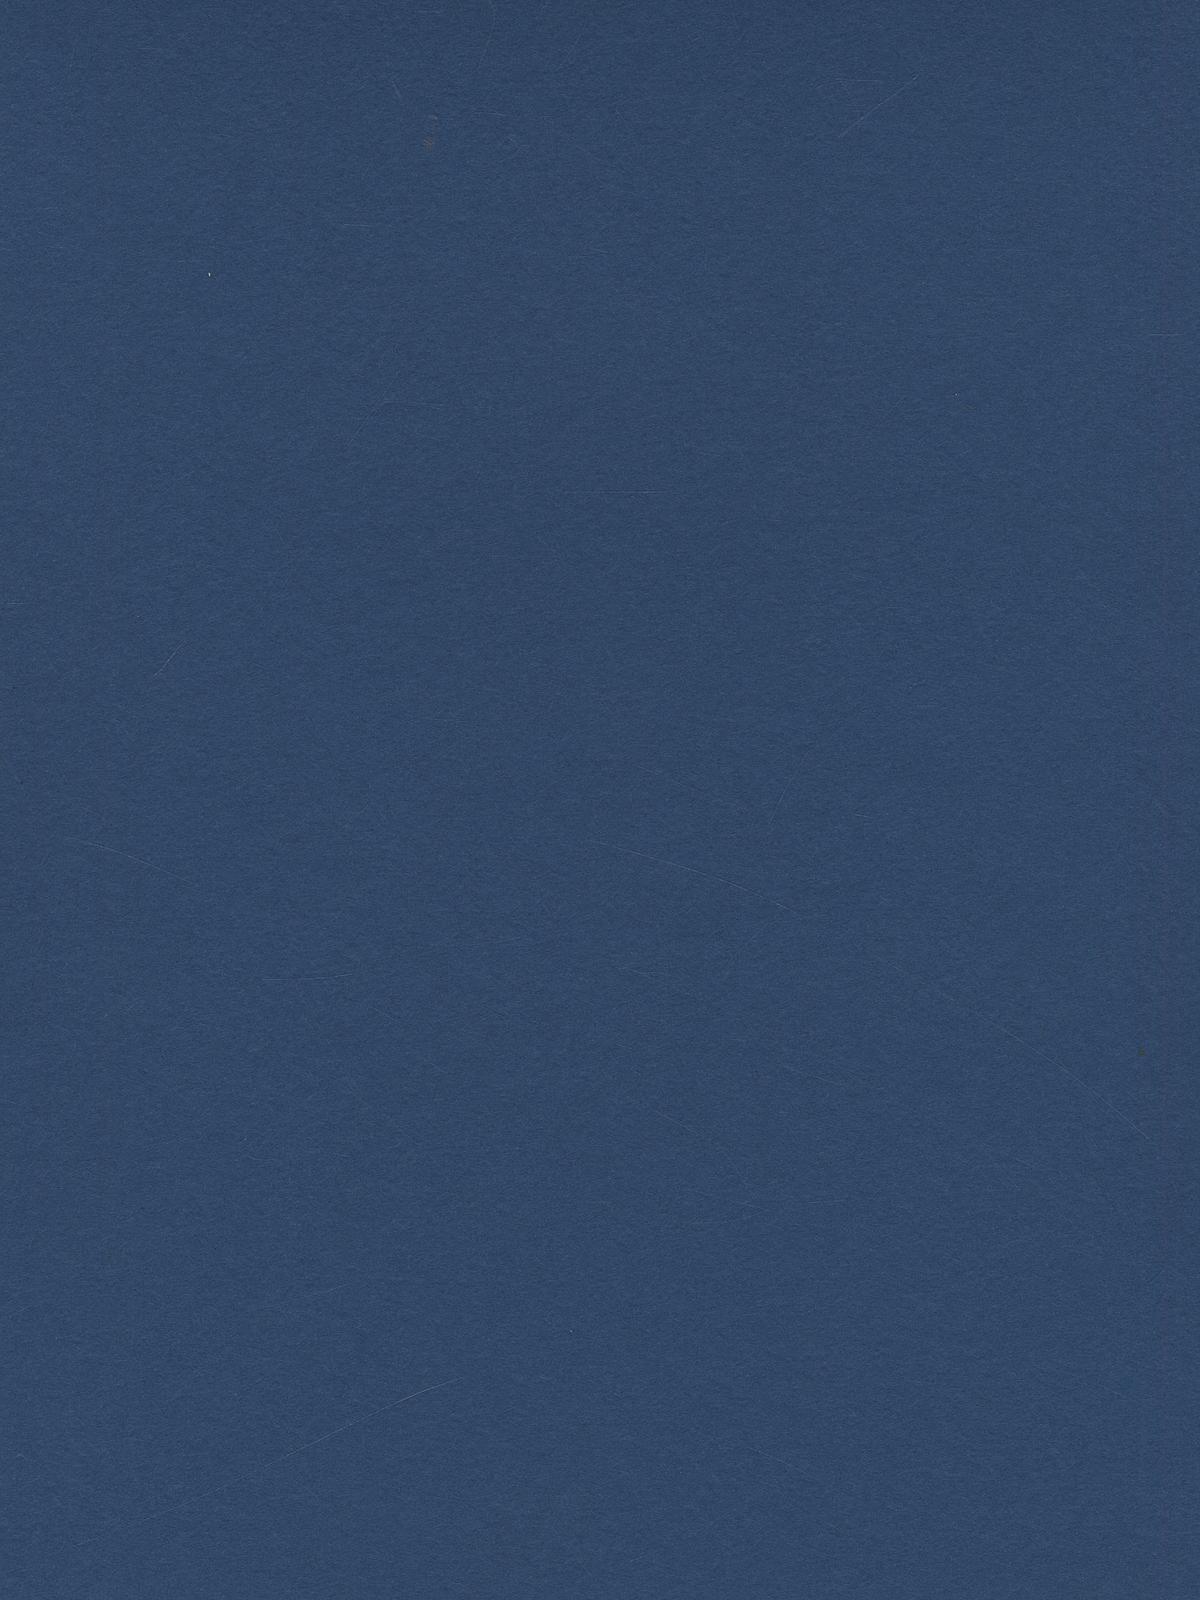 Classic Cardstock 8 1 2 In. X 11 In. Nautical Blue Dark Sheet